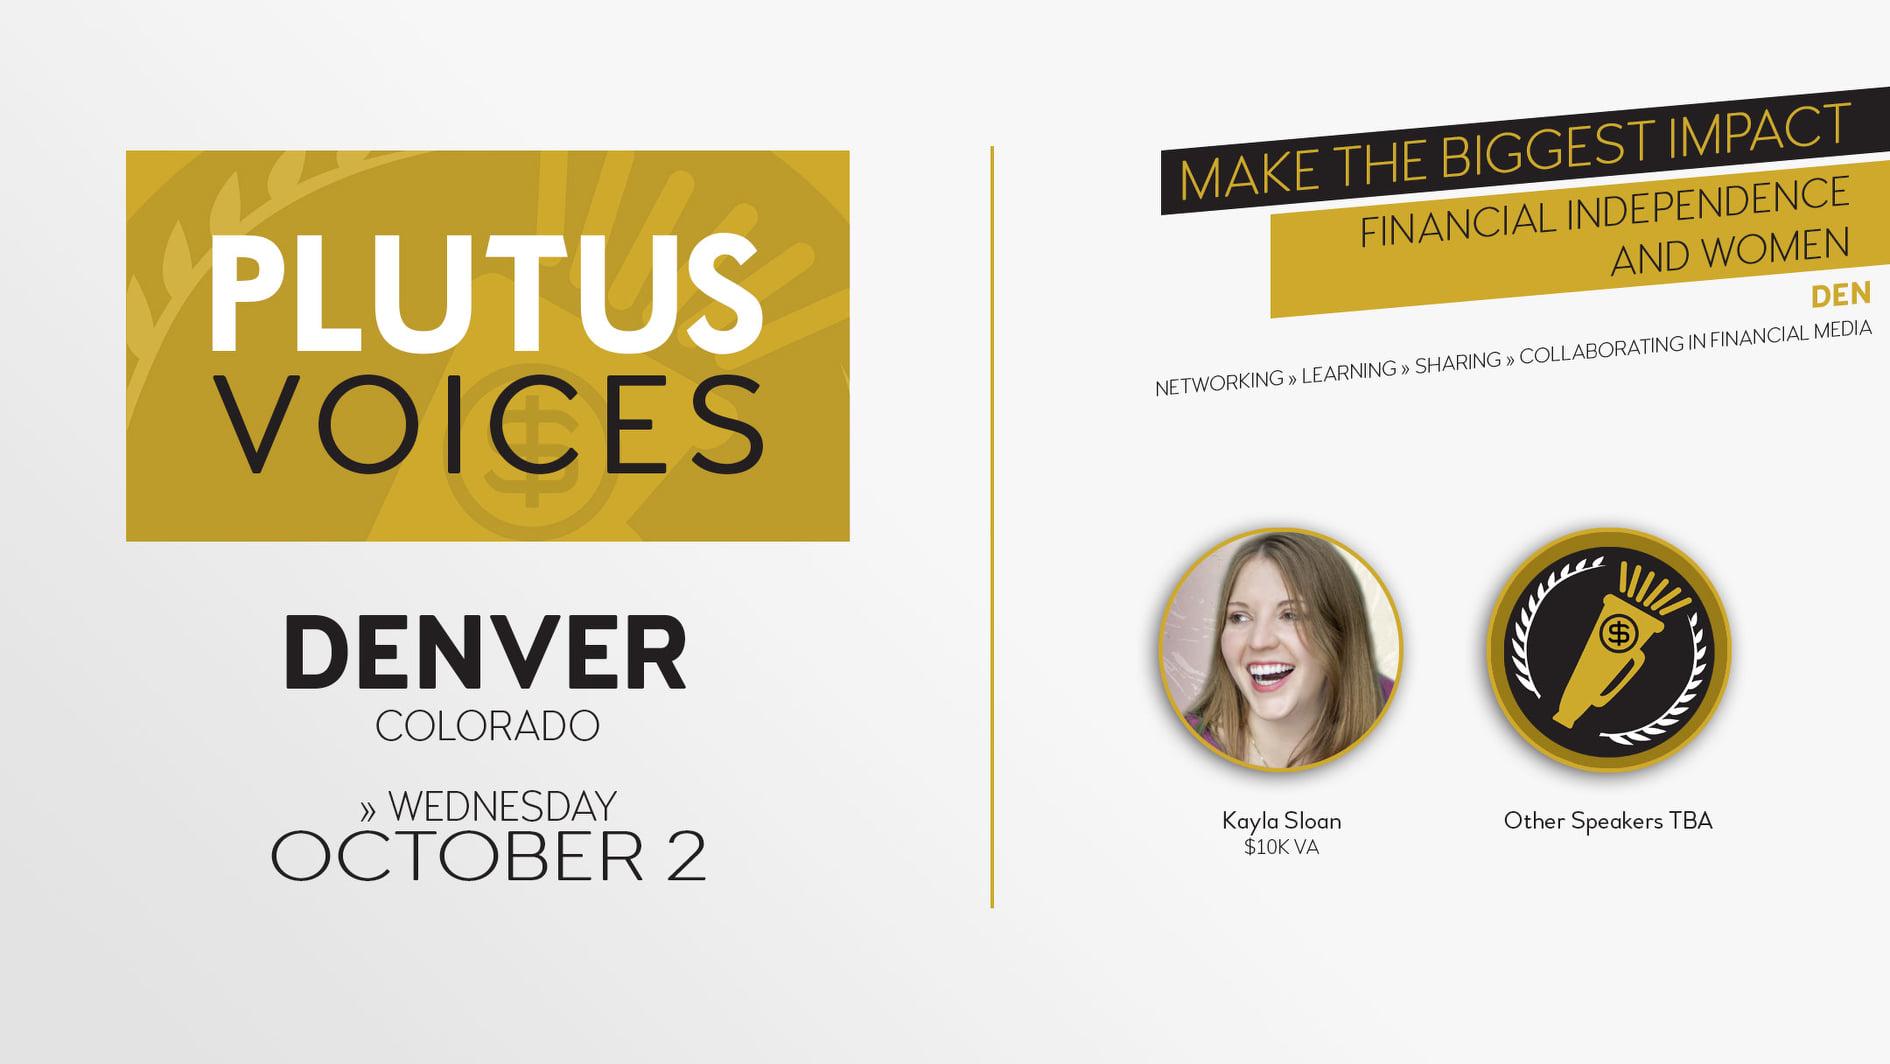 Plutus Voices Denver 2019